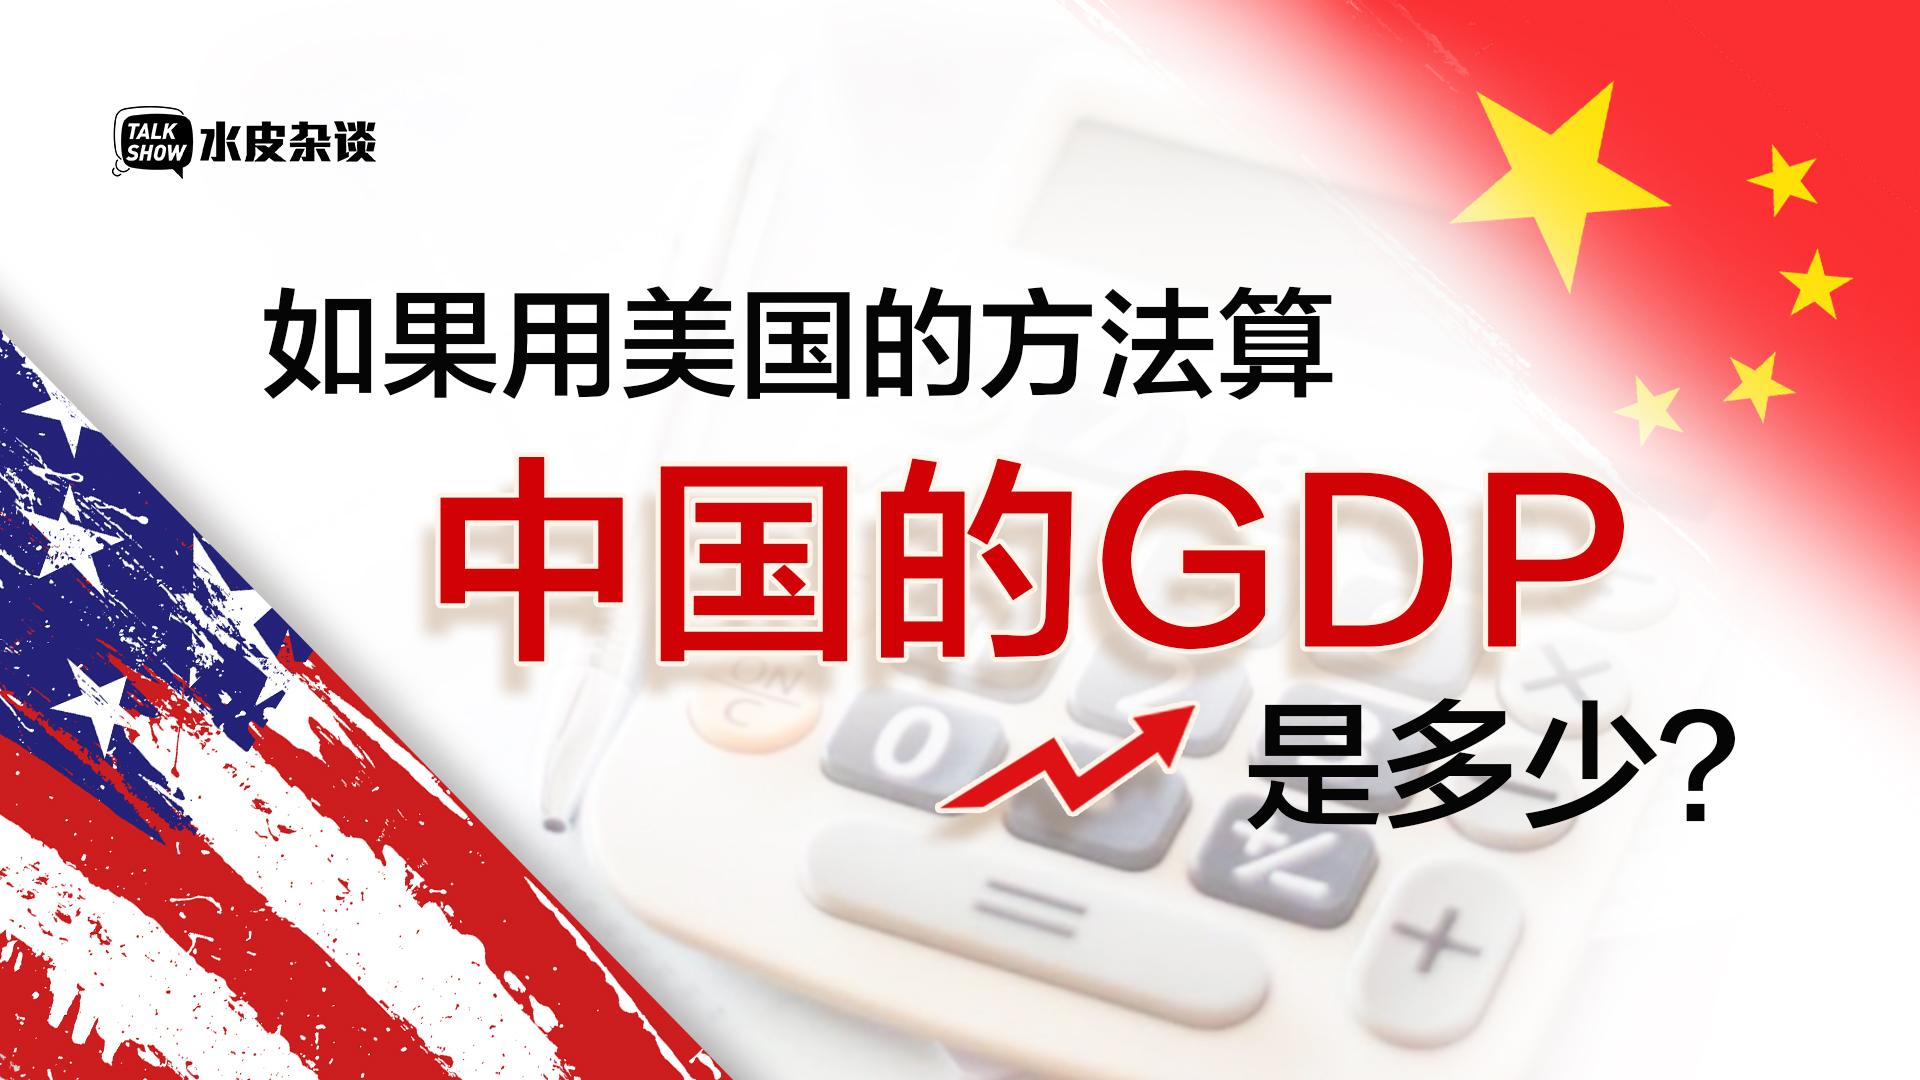 gdp新算法_未采用新算法!2019年越南GDP约2600亿美元,人均近2700美元